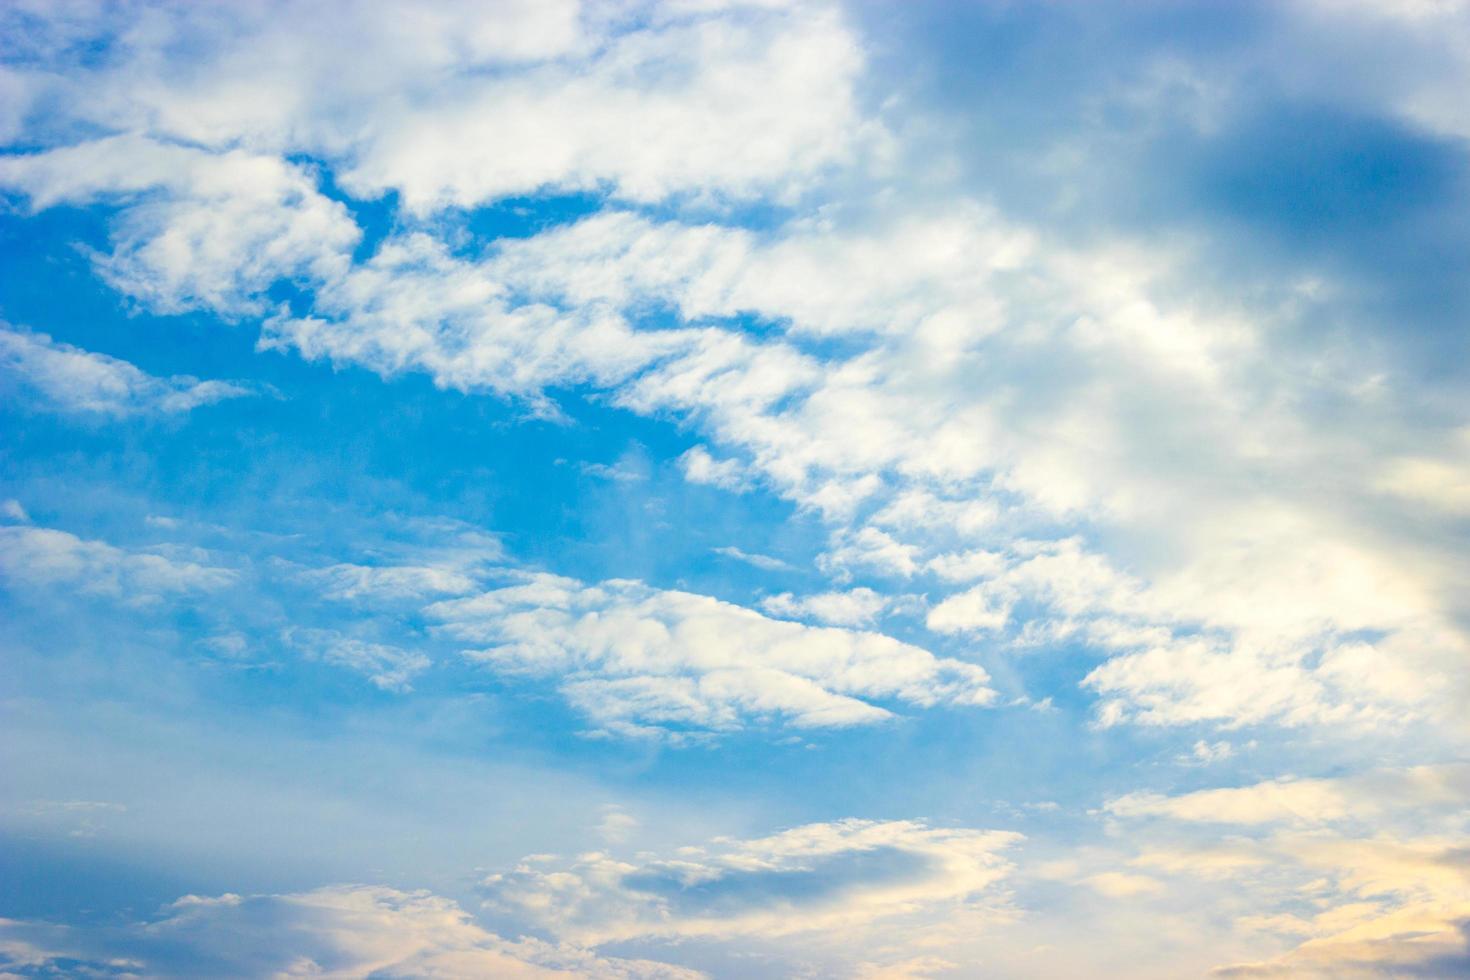 blauwe lucht en witte wolken bij zonsondergang foto